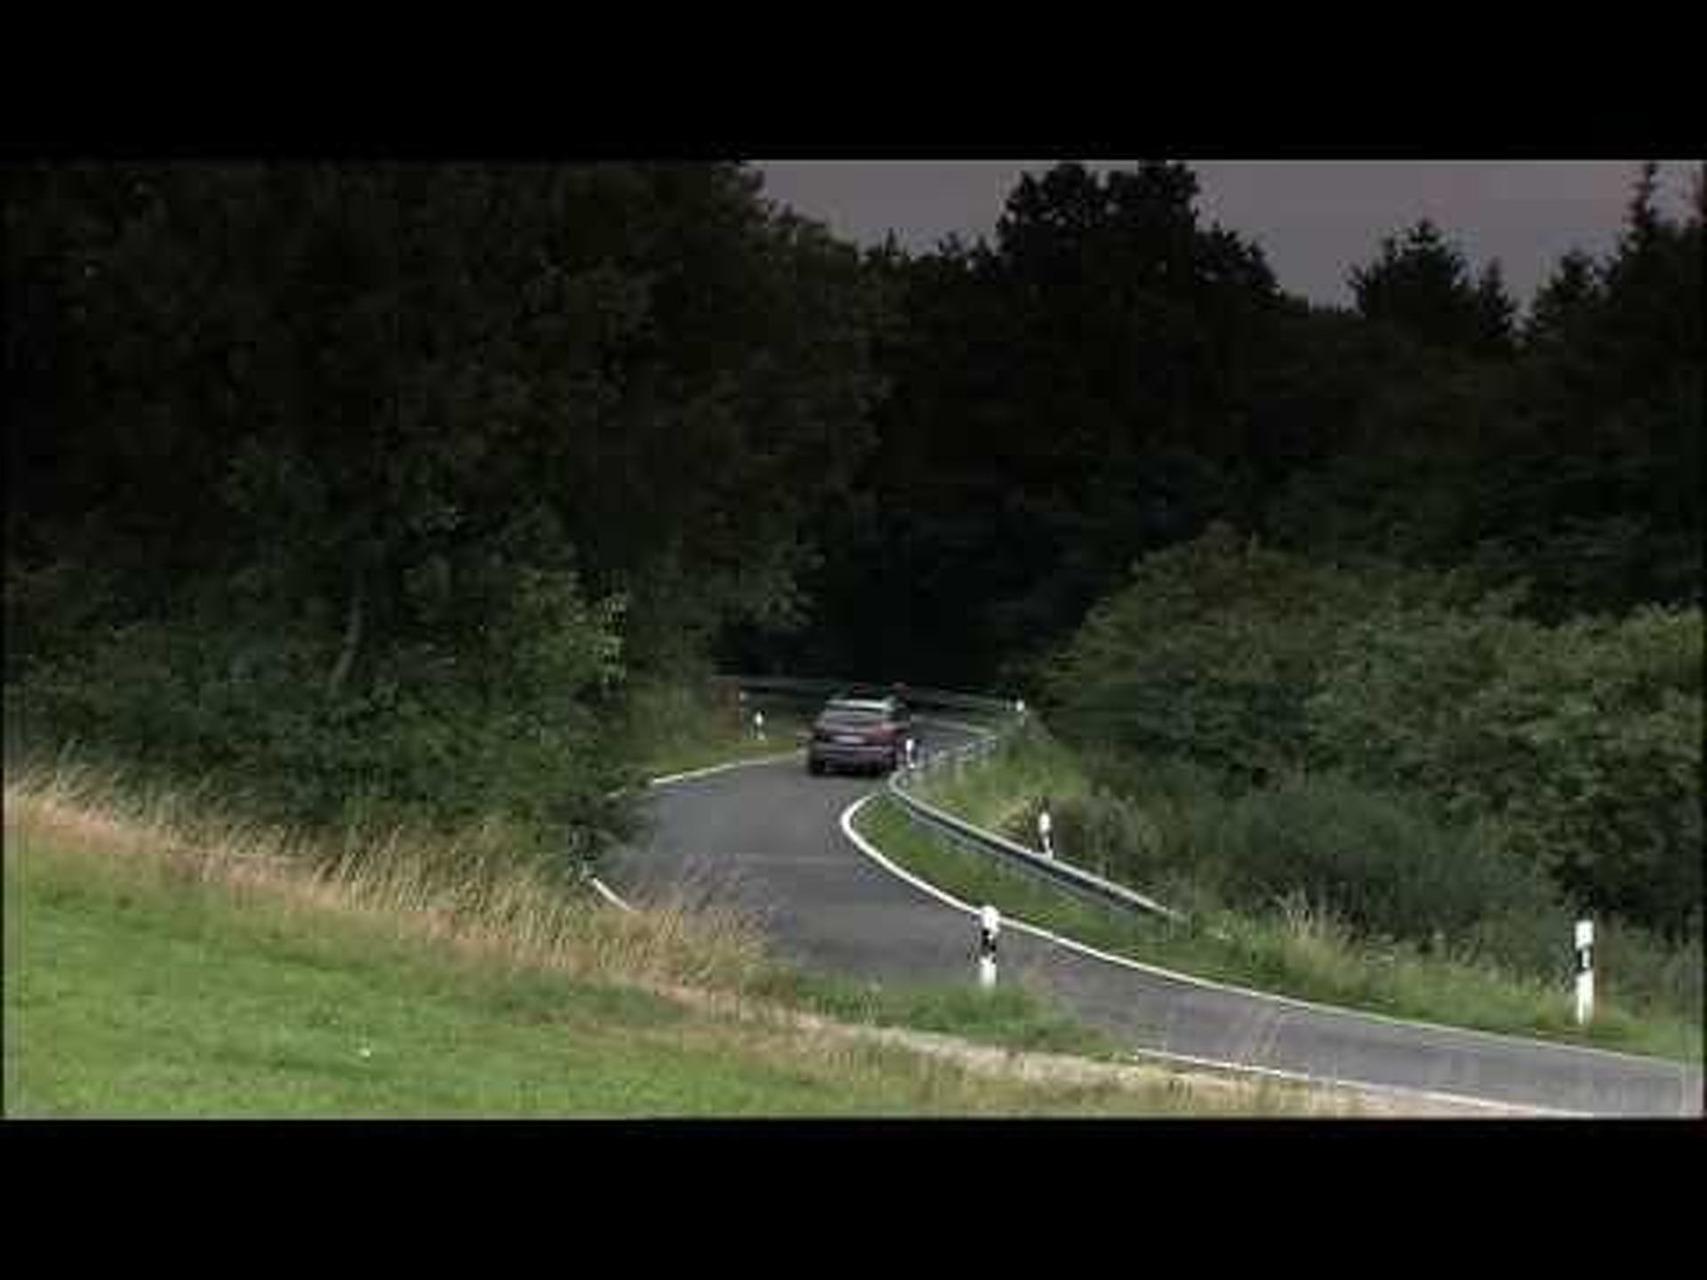 2011 Audi Q7 V12 Driving Footage